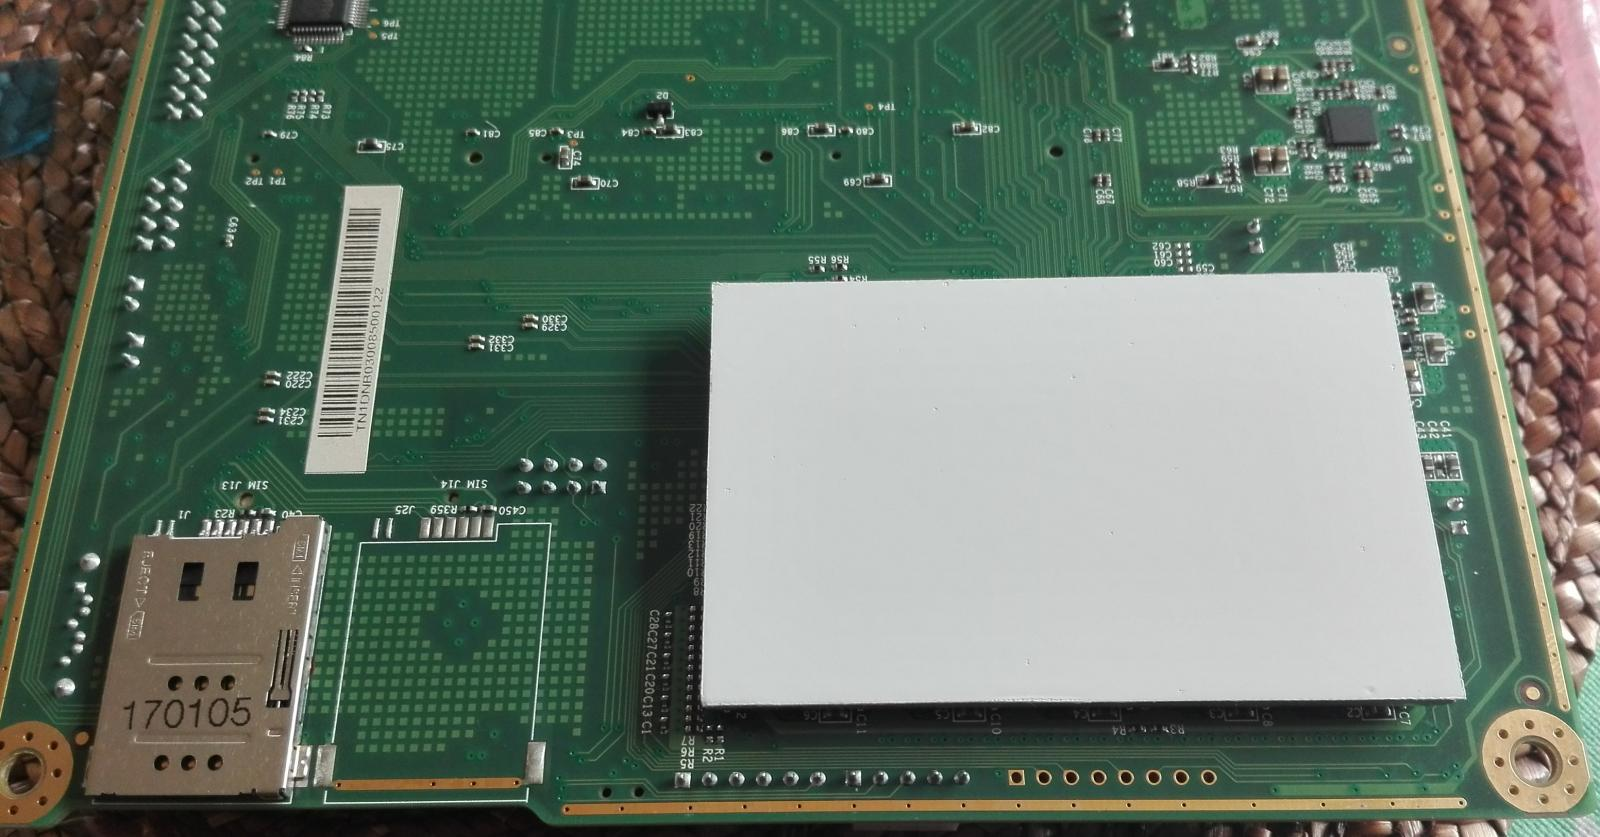 apu-pfsense-vpn-router-keri-3-2017